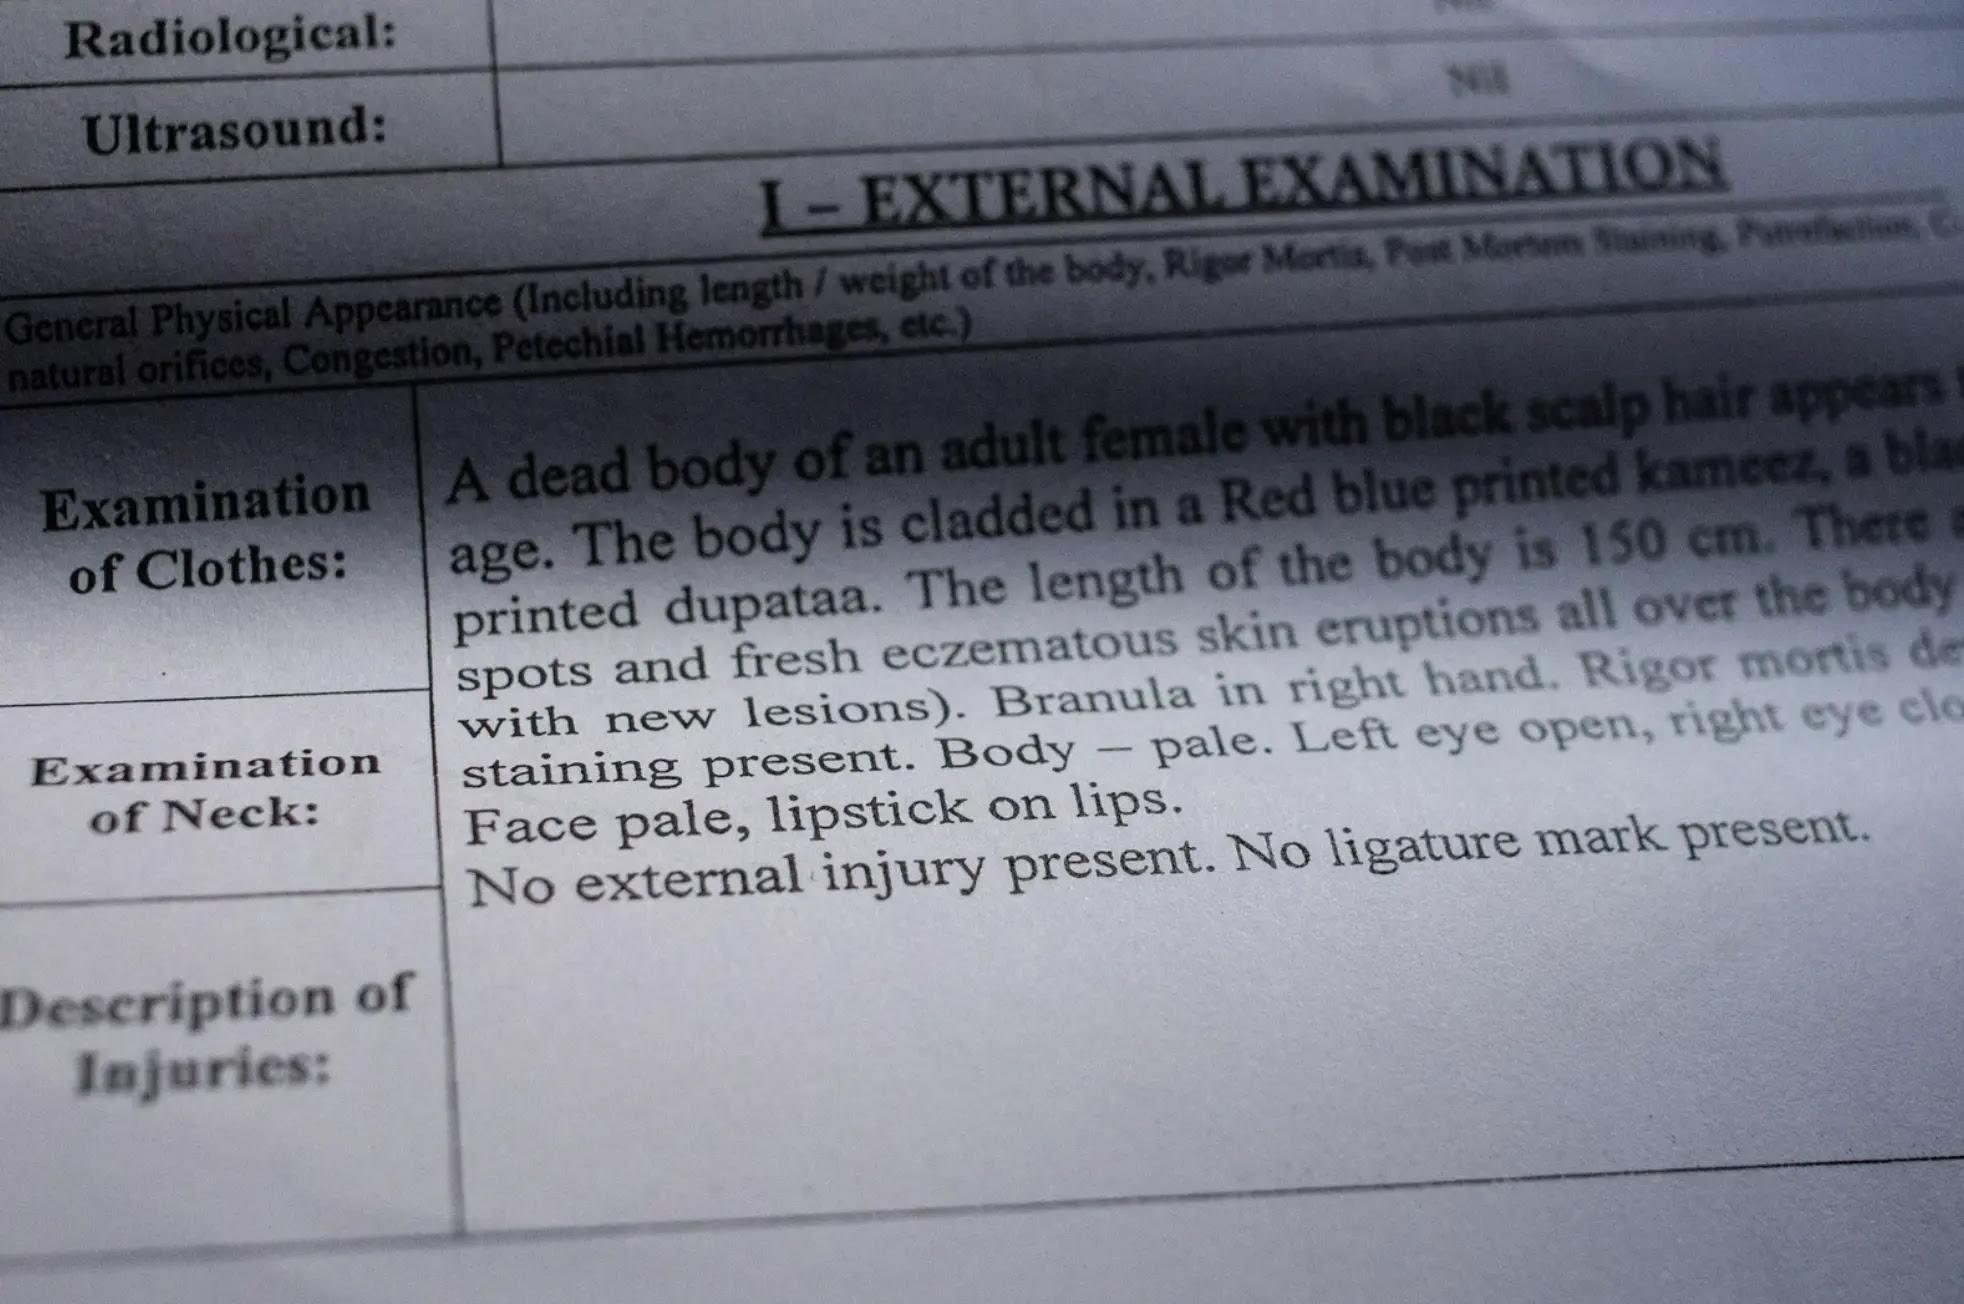 Image of postmortem report.